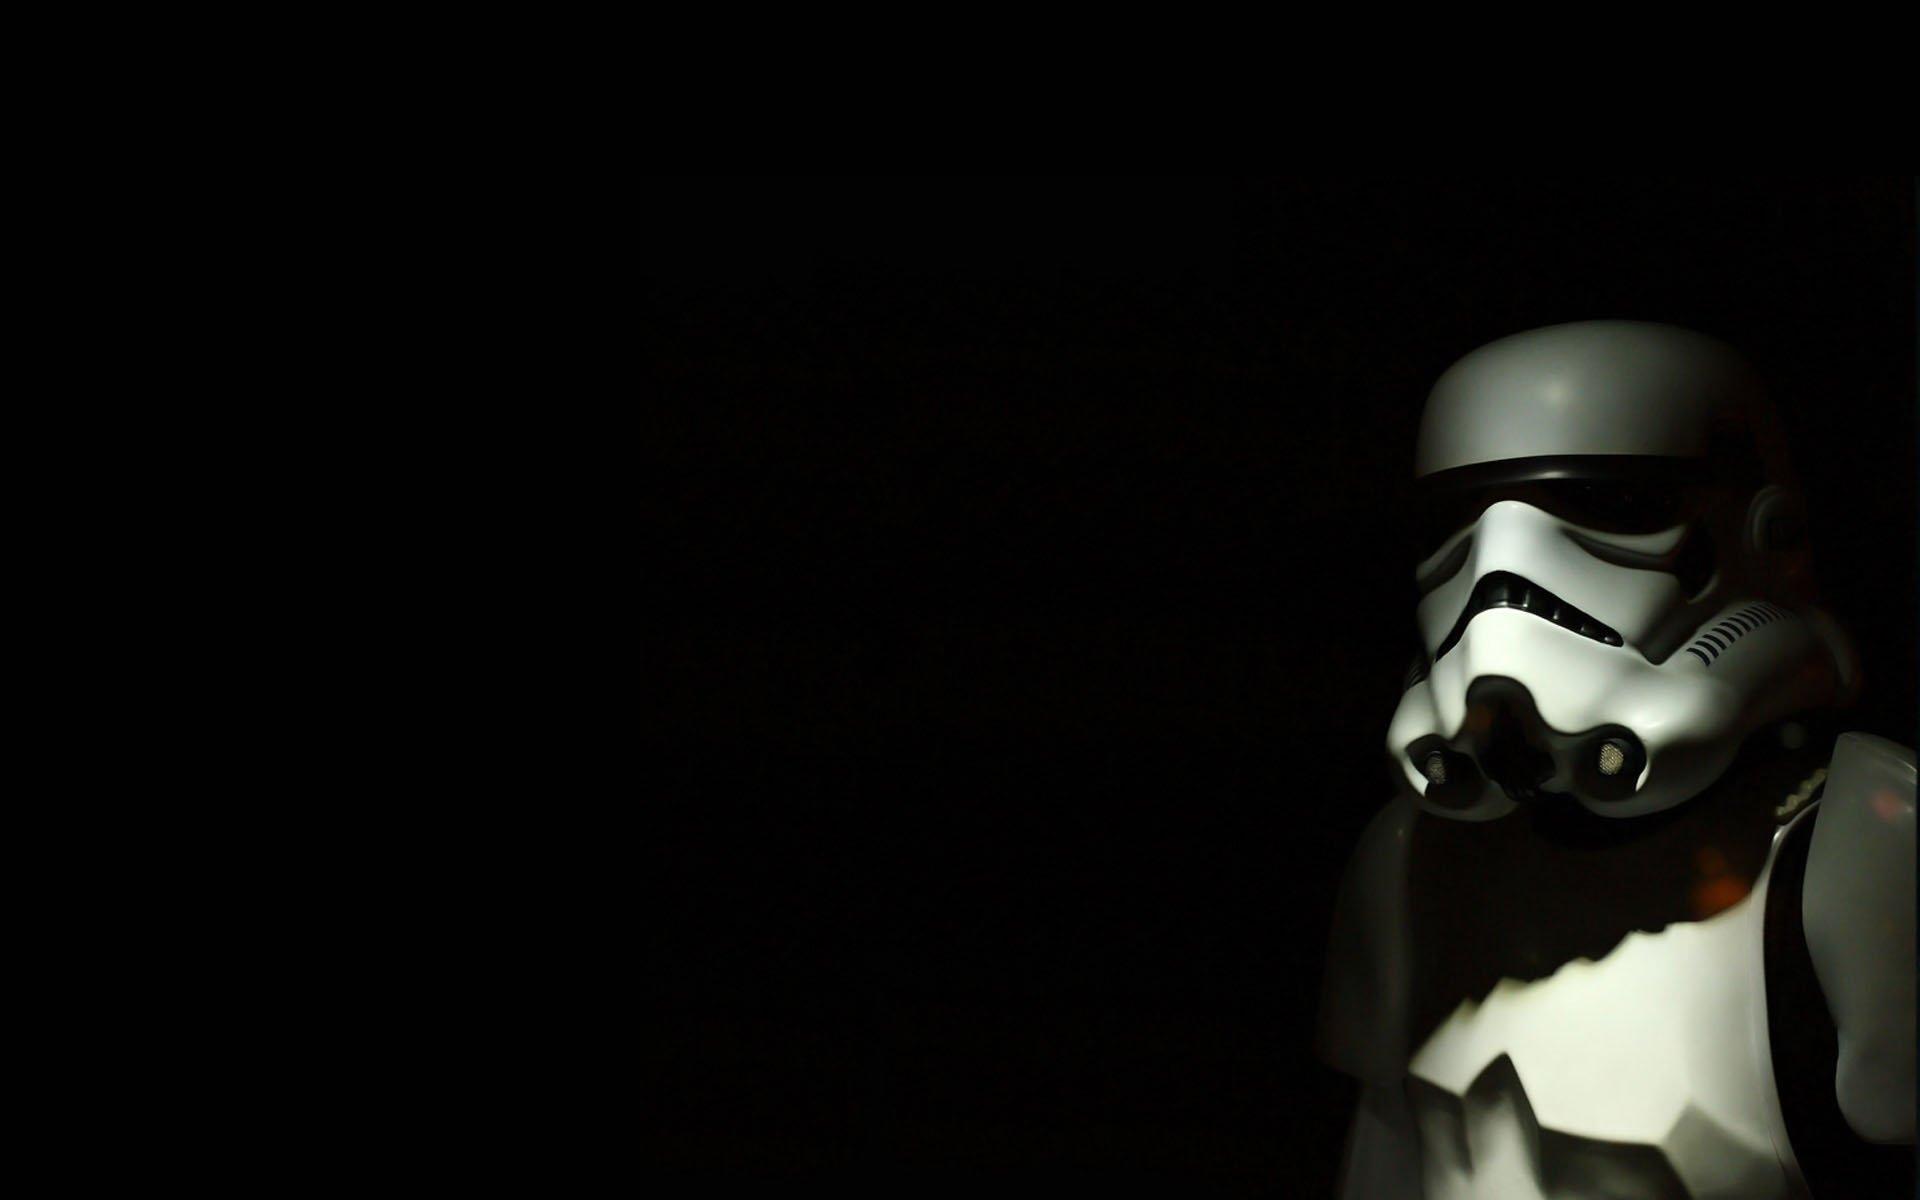 star wars black stormtroopers simple background black background